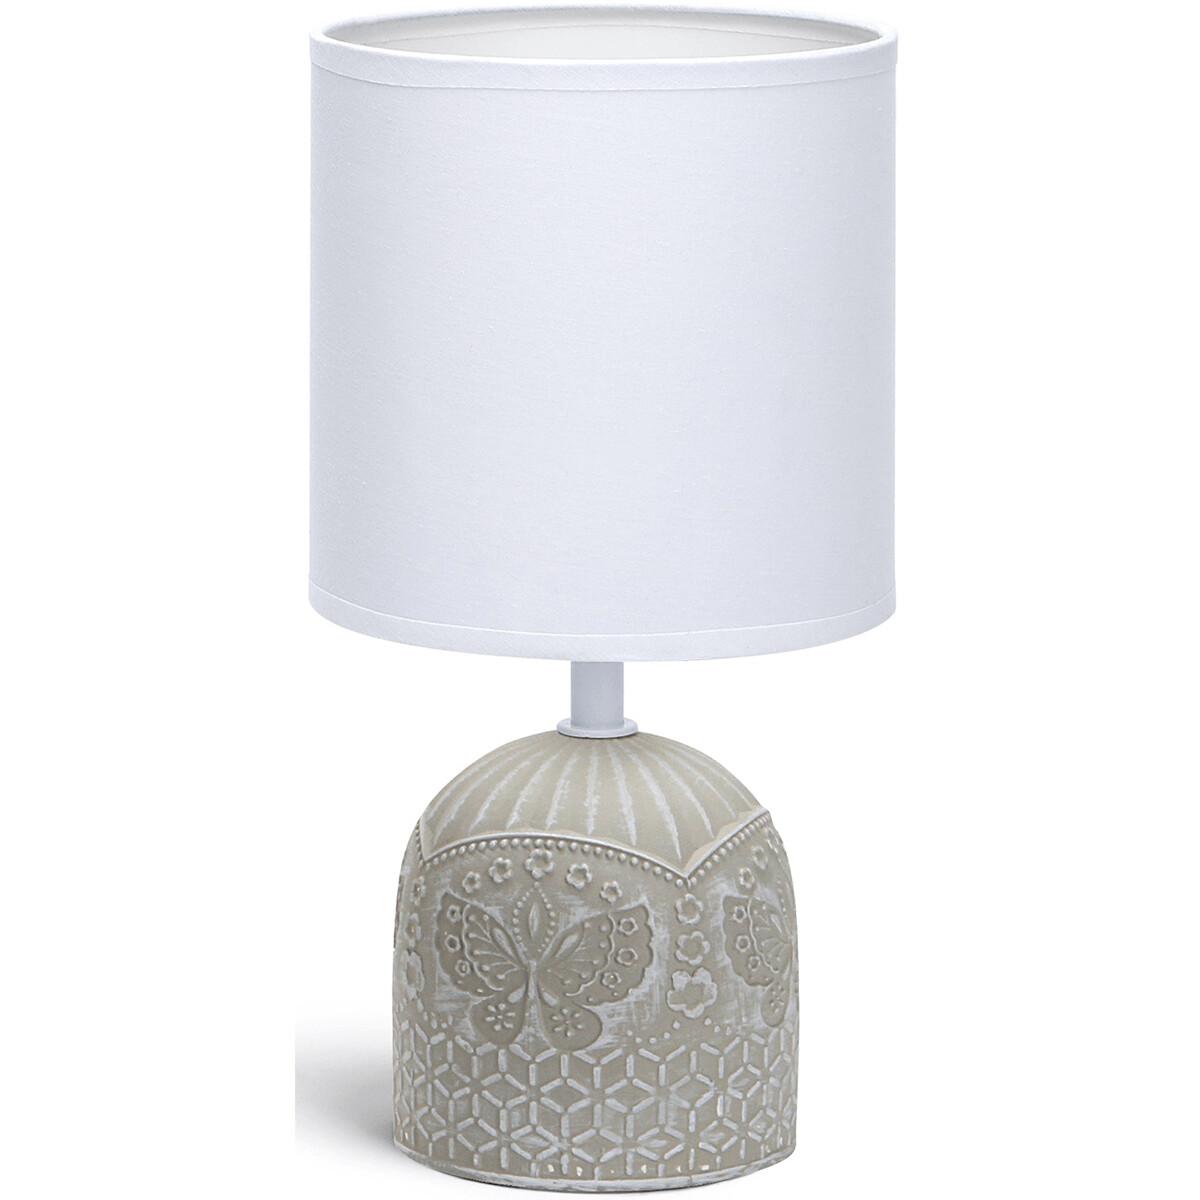 LED Tafellamp - Tafelverlichting - Aigi Cruni - E14 Fitting - Rond - Mat Grijs - Keramiek